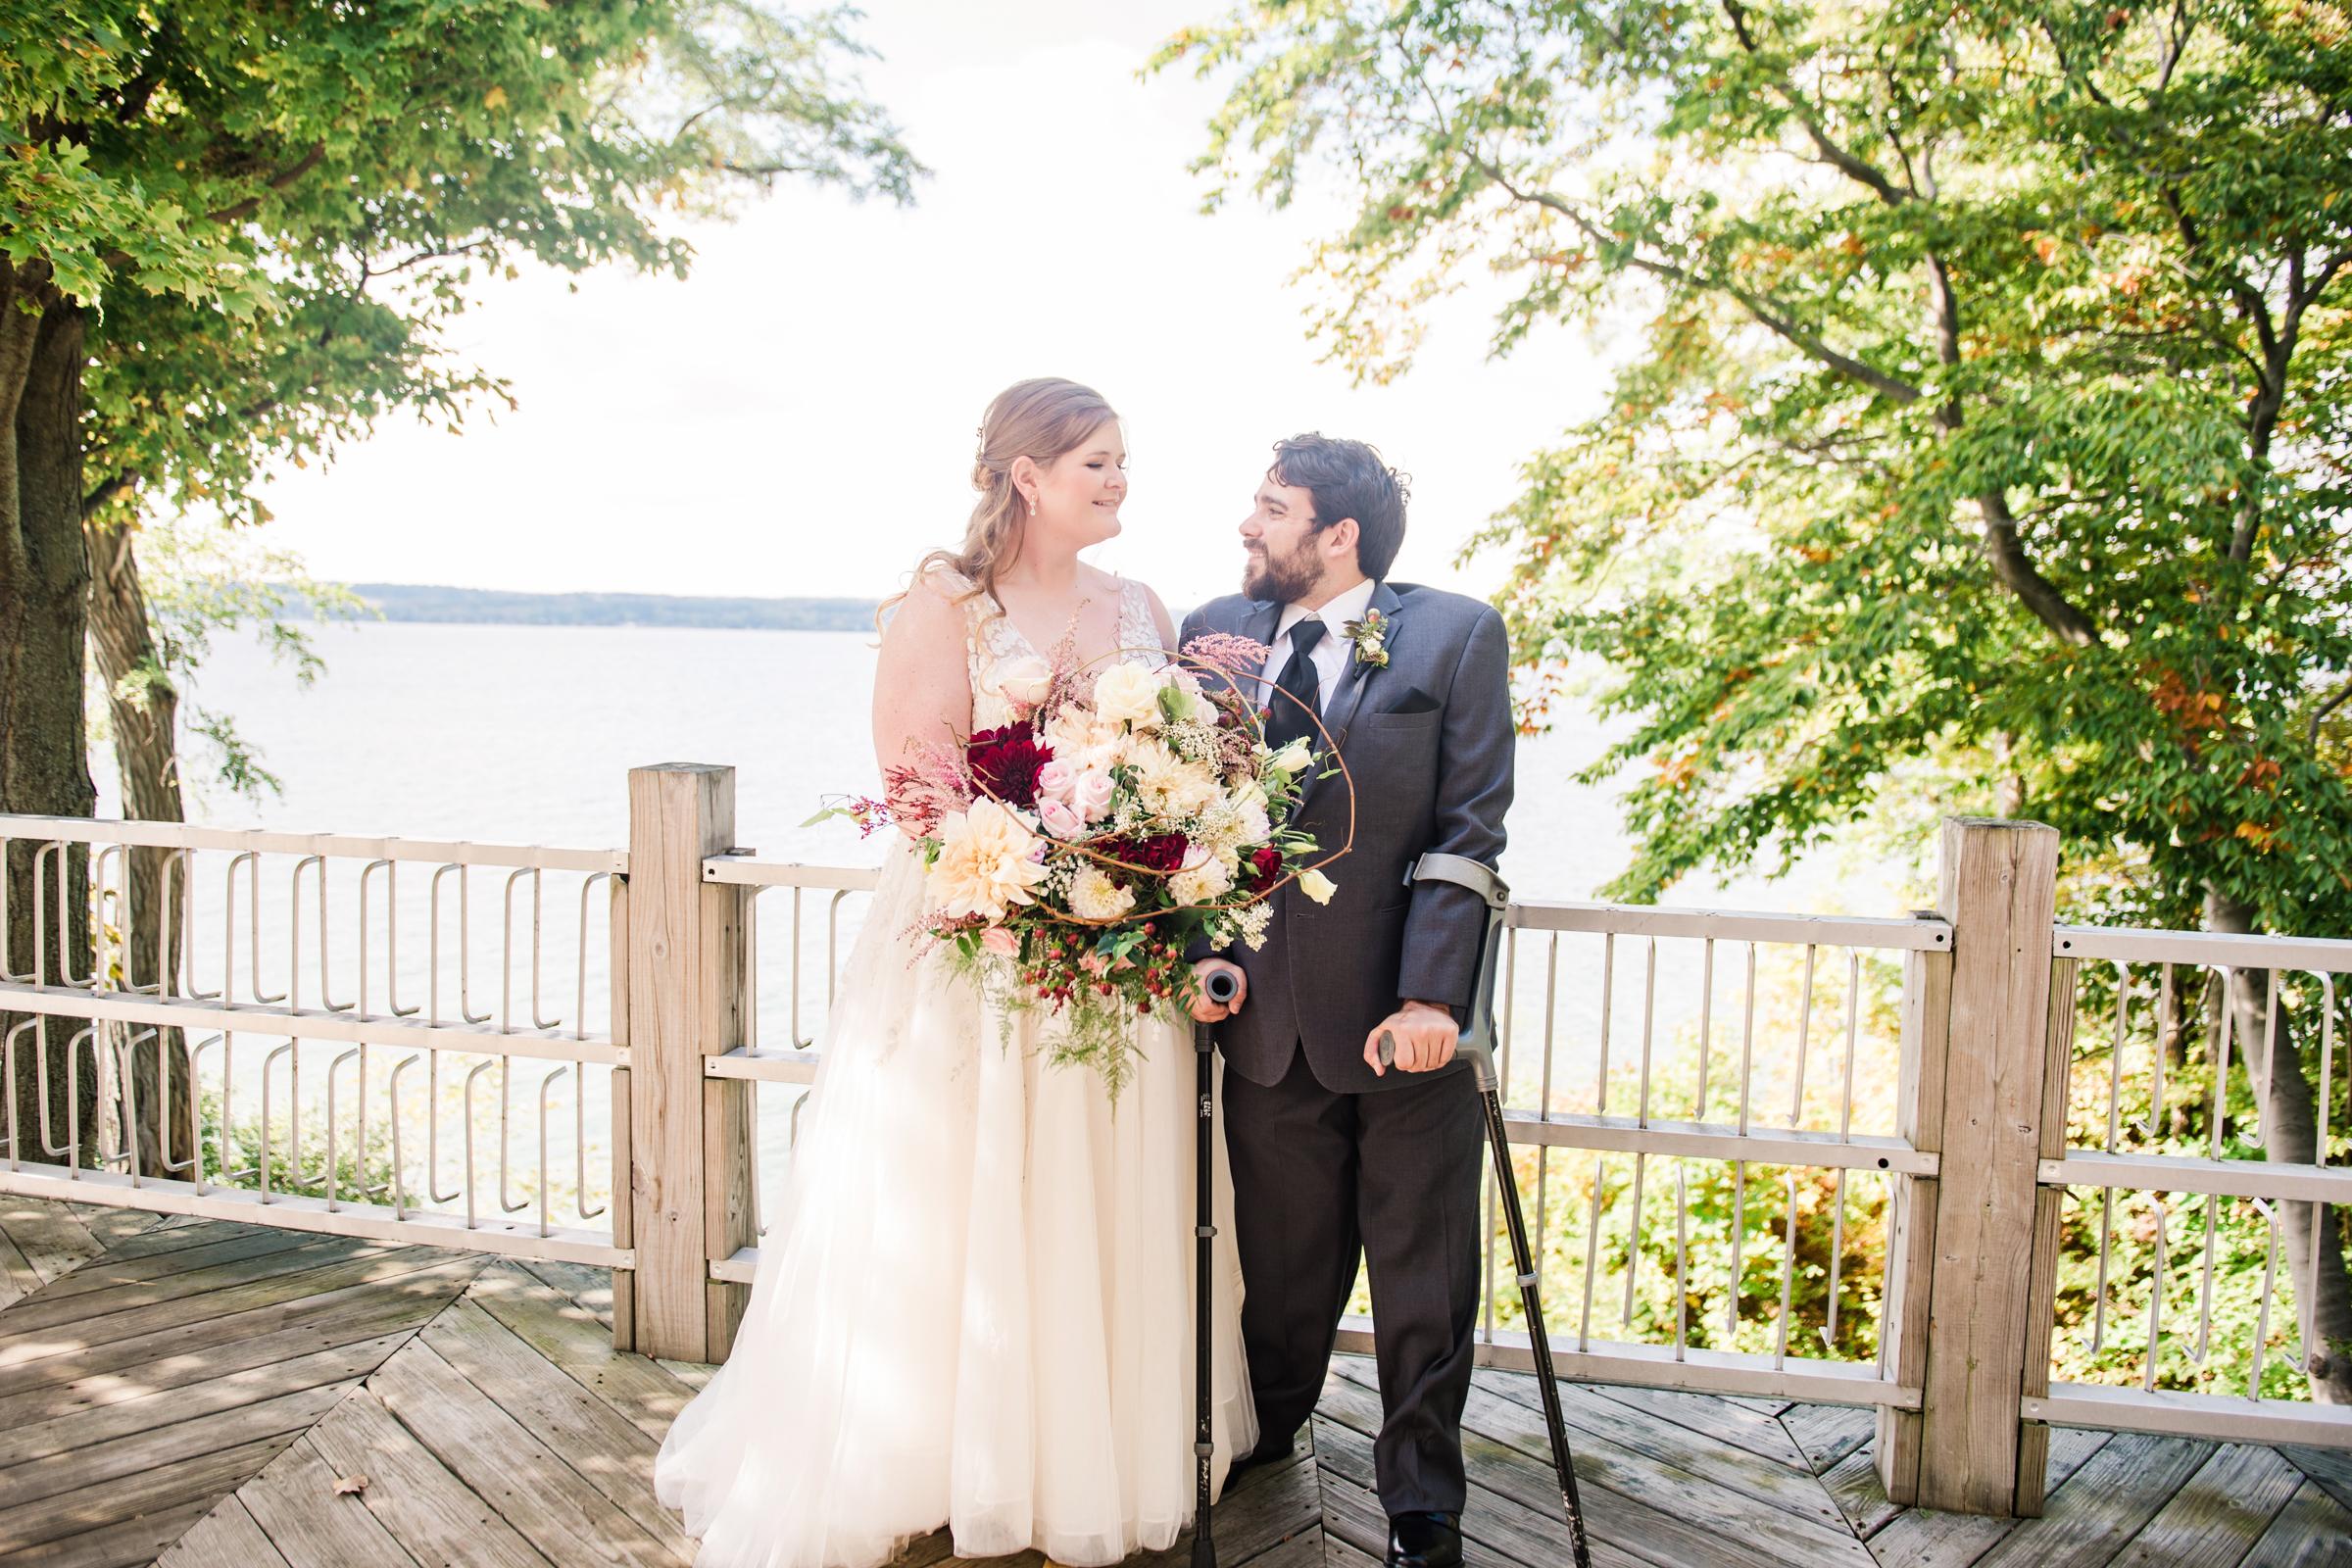 Zugibe_Vineyards_Finger_Lakes_Wedding_JILL_STUDIO_Rochester_NY_Photographer_DSC_3472.jpg